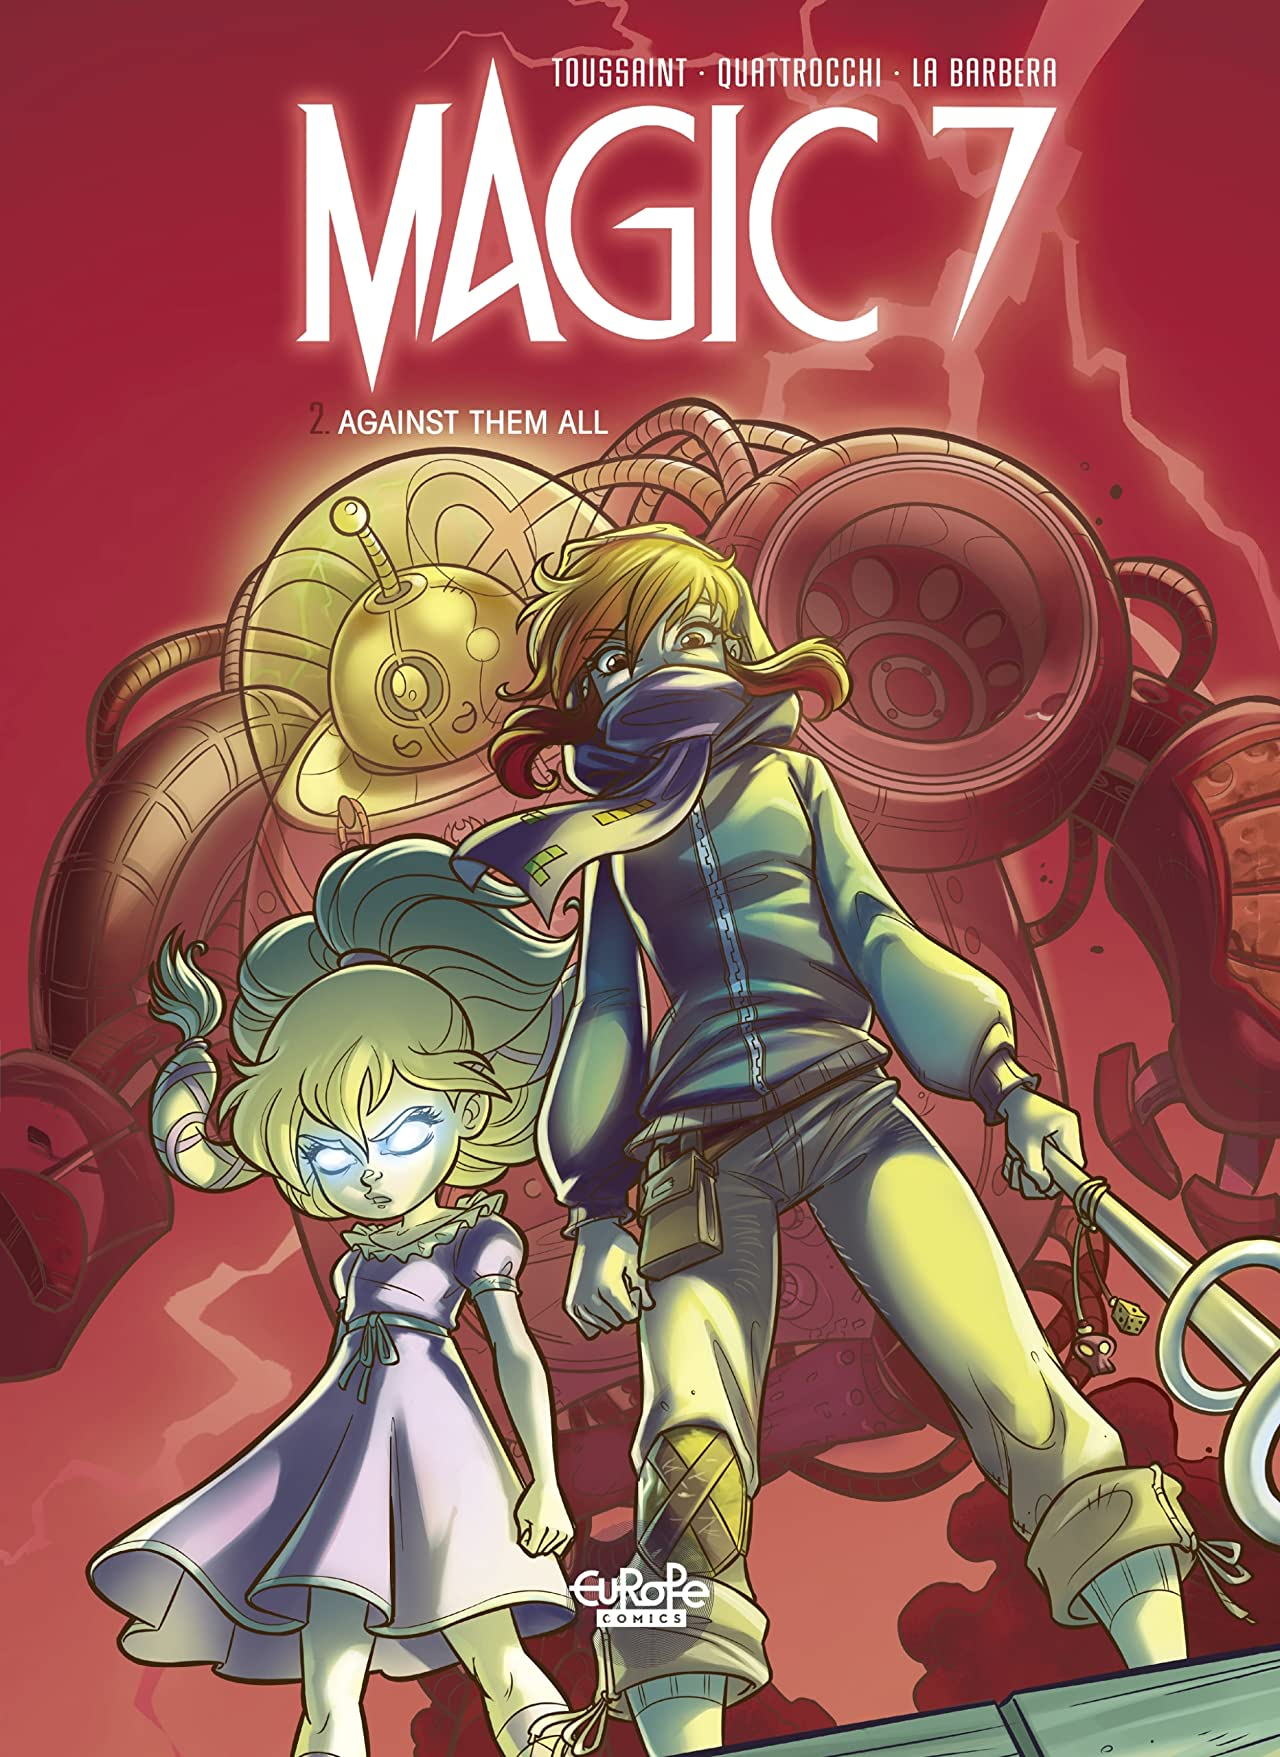 Magic 7 Vol. 2: Against Them All